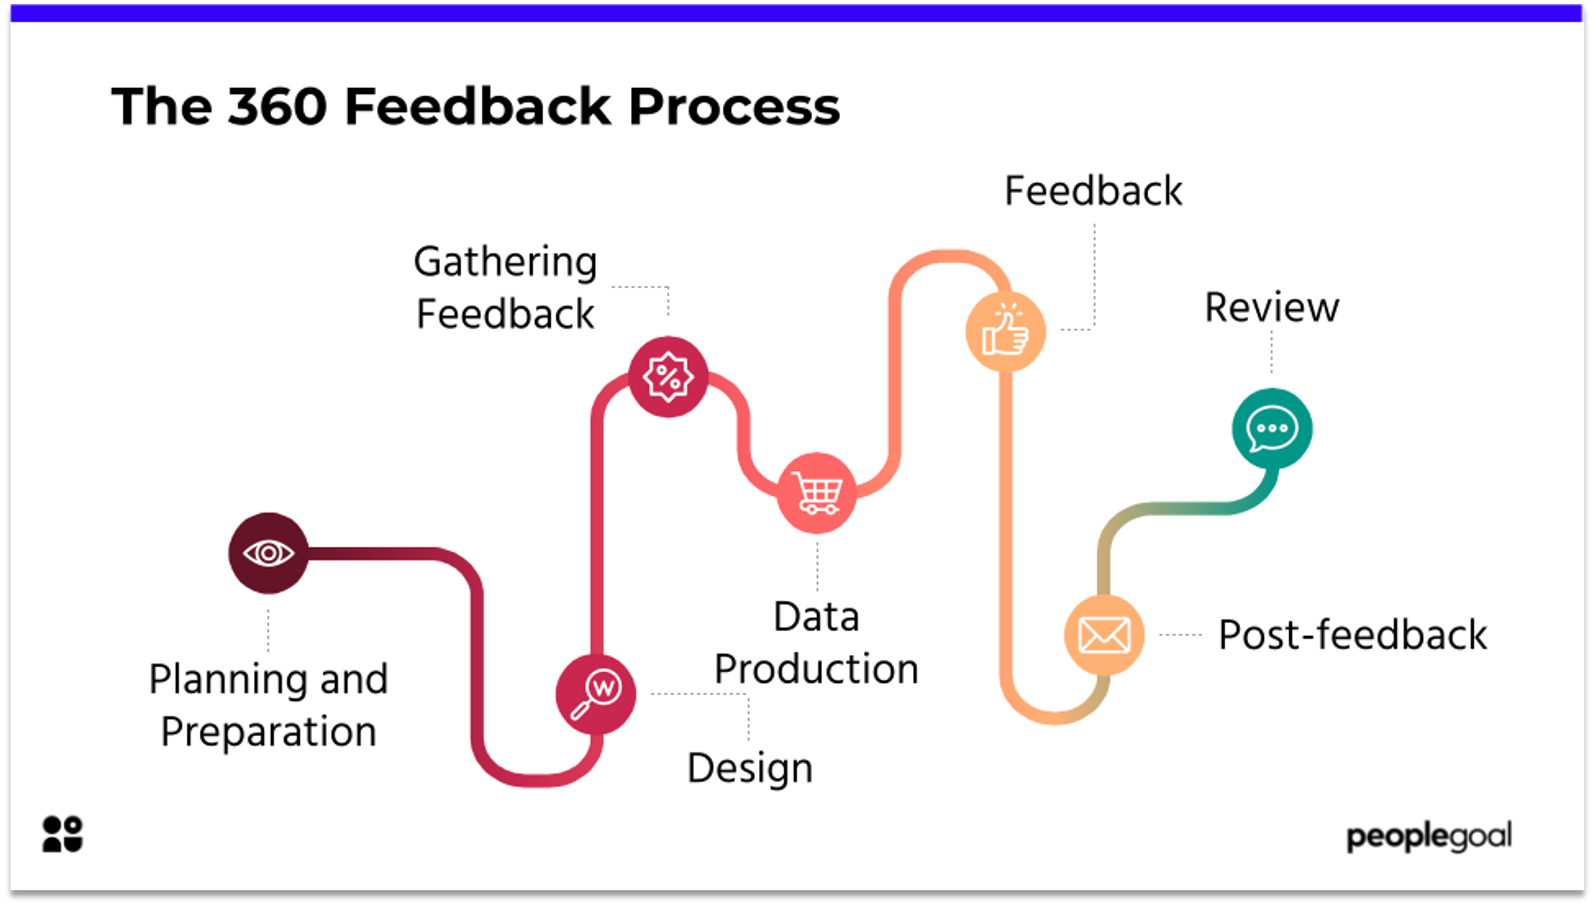 The 360 feedback process